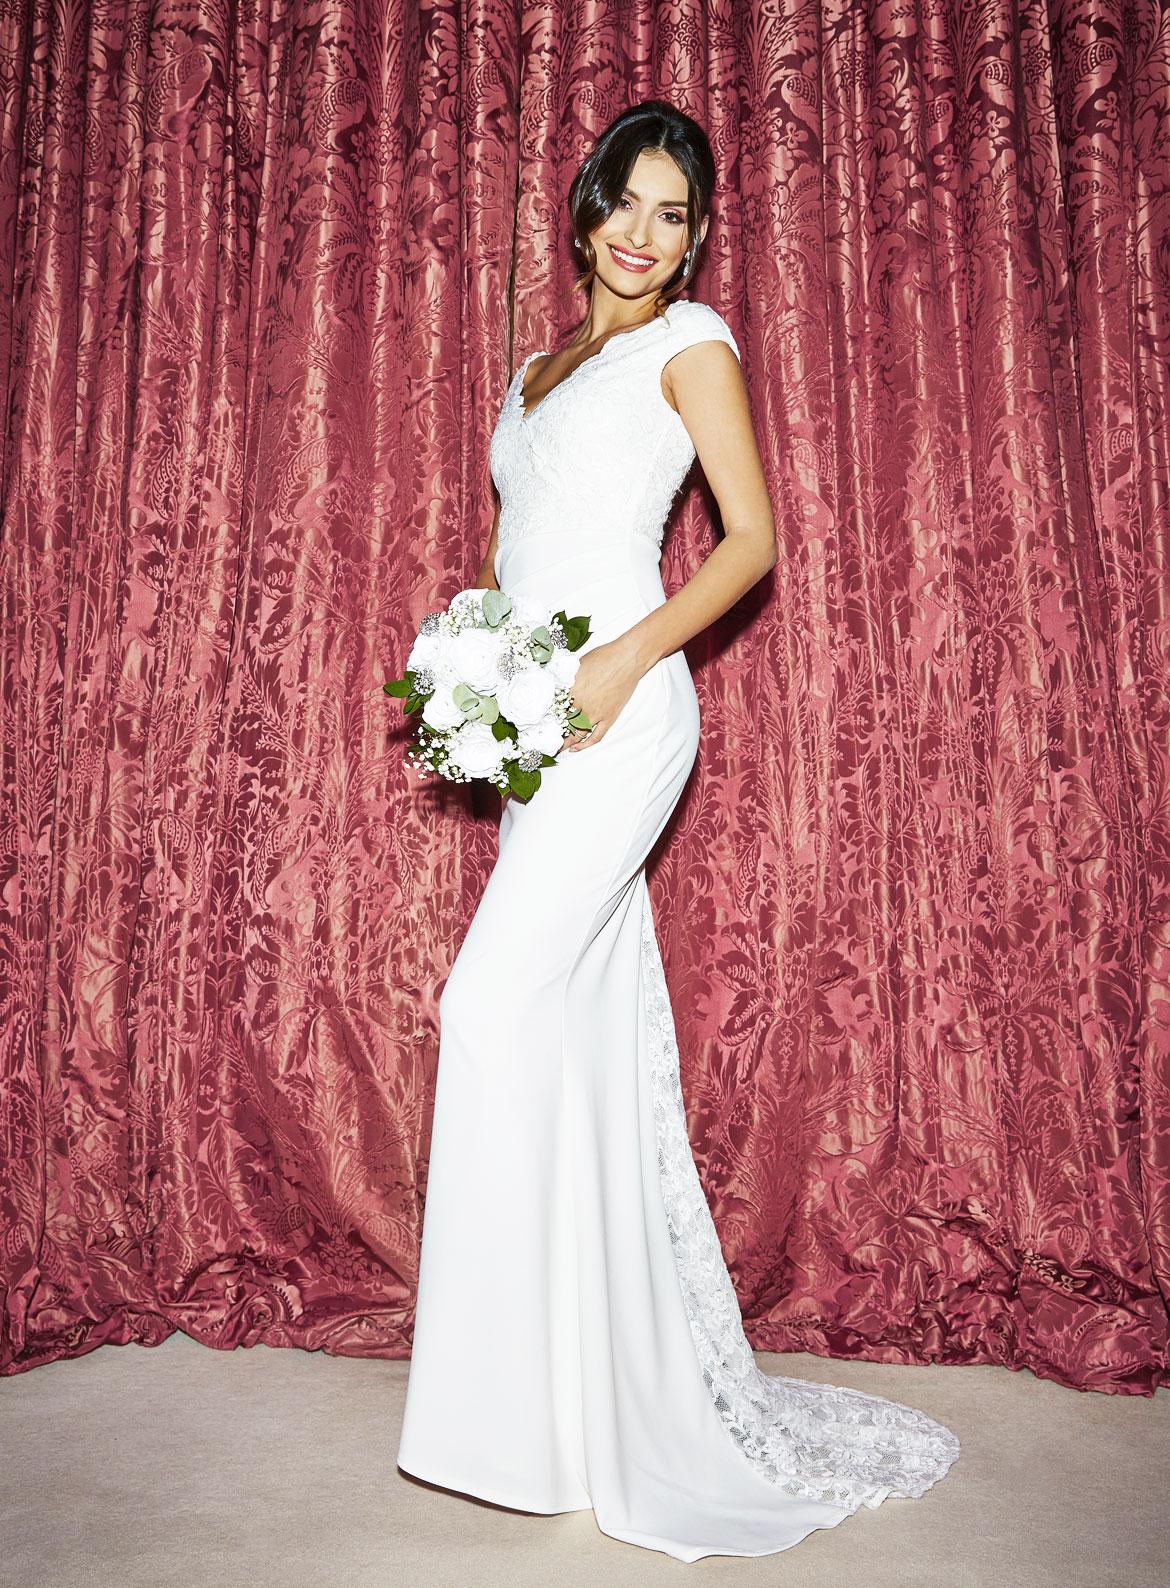 Increíble Wedding Dresses East Kilbride Fotos - Ideas de Estilos de ...